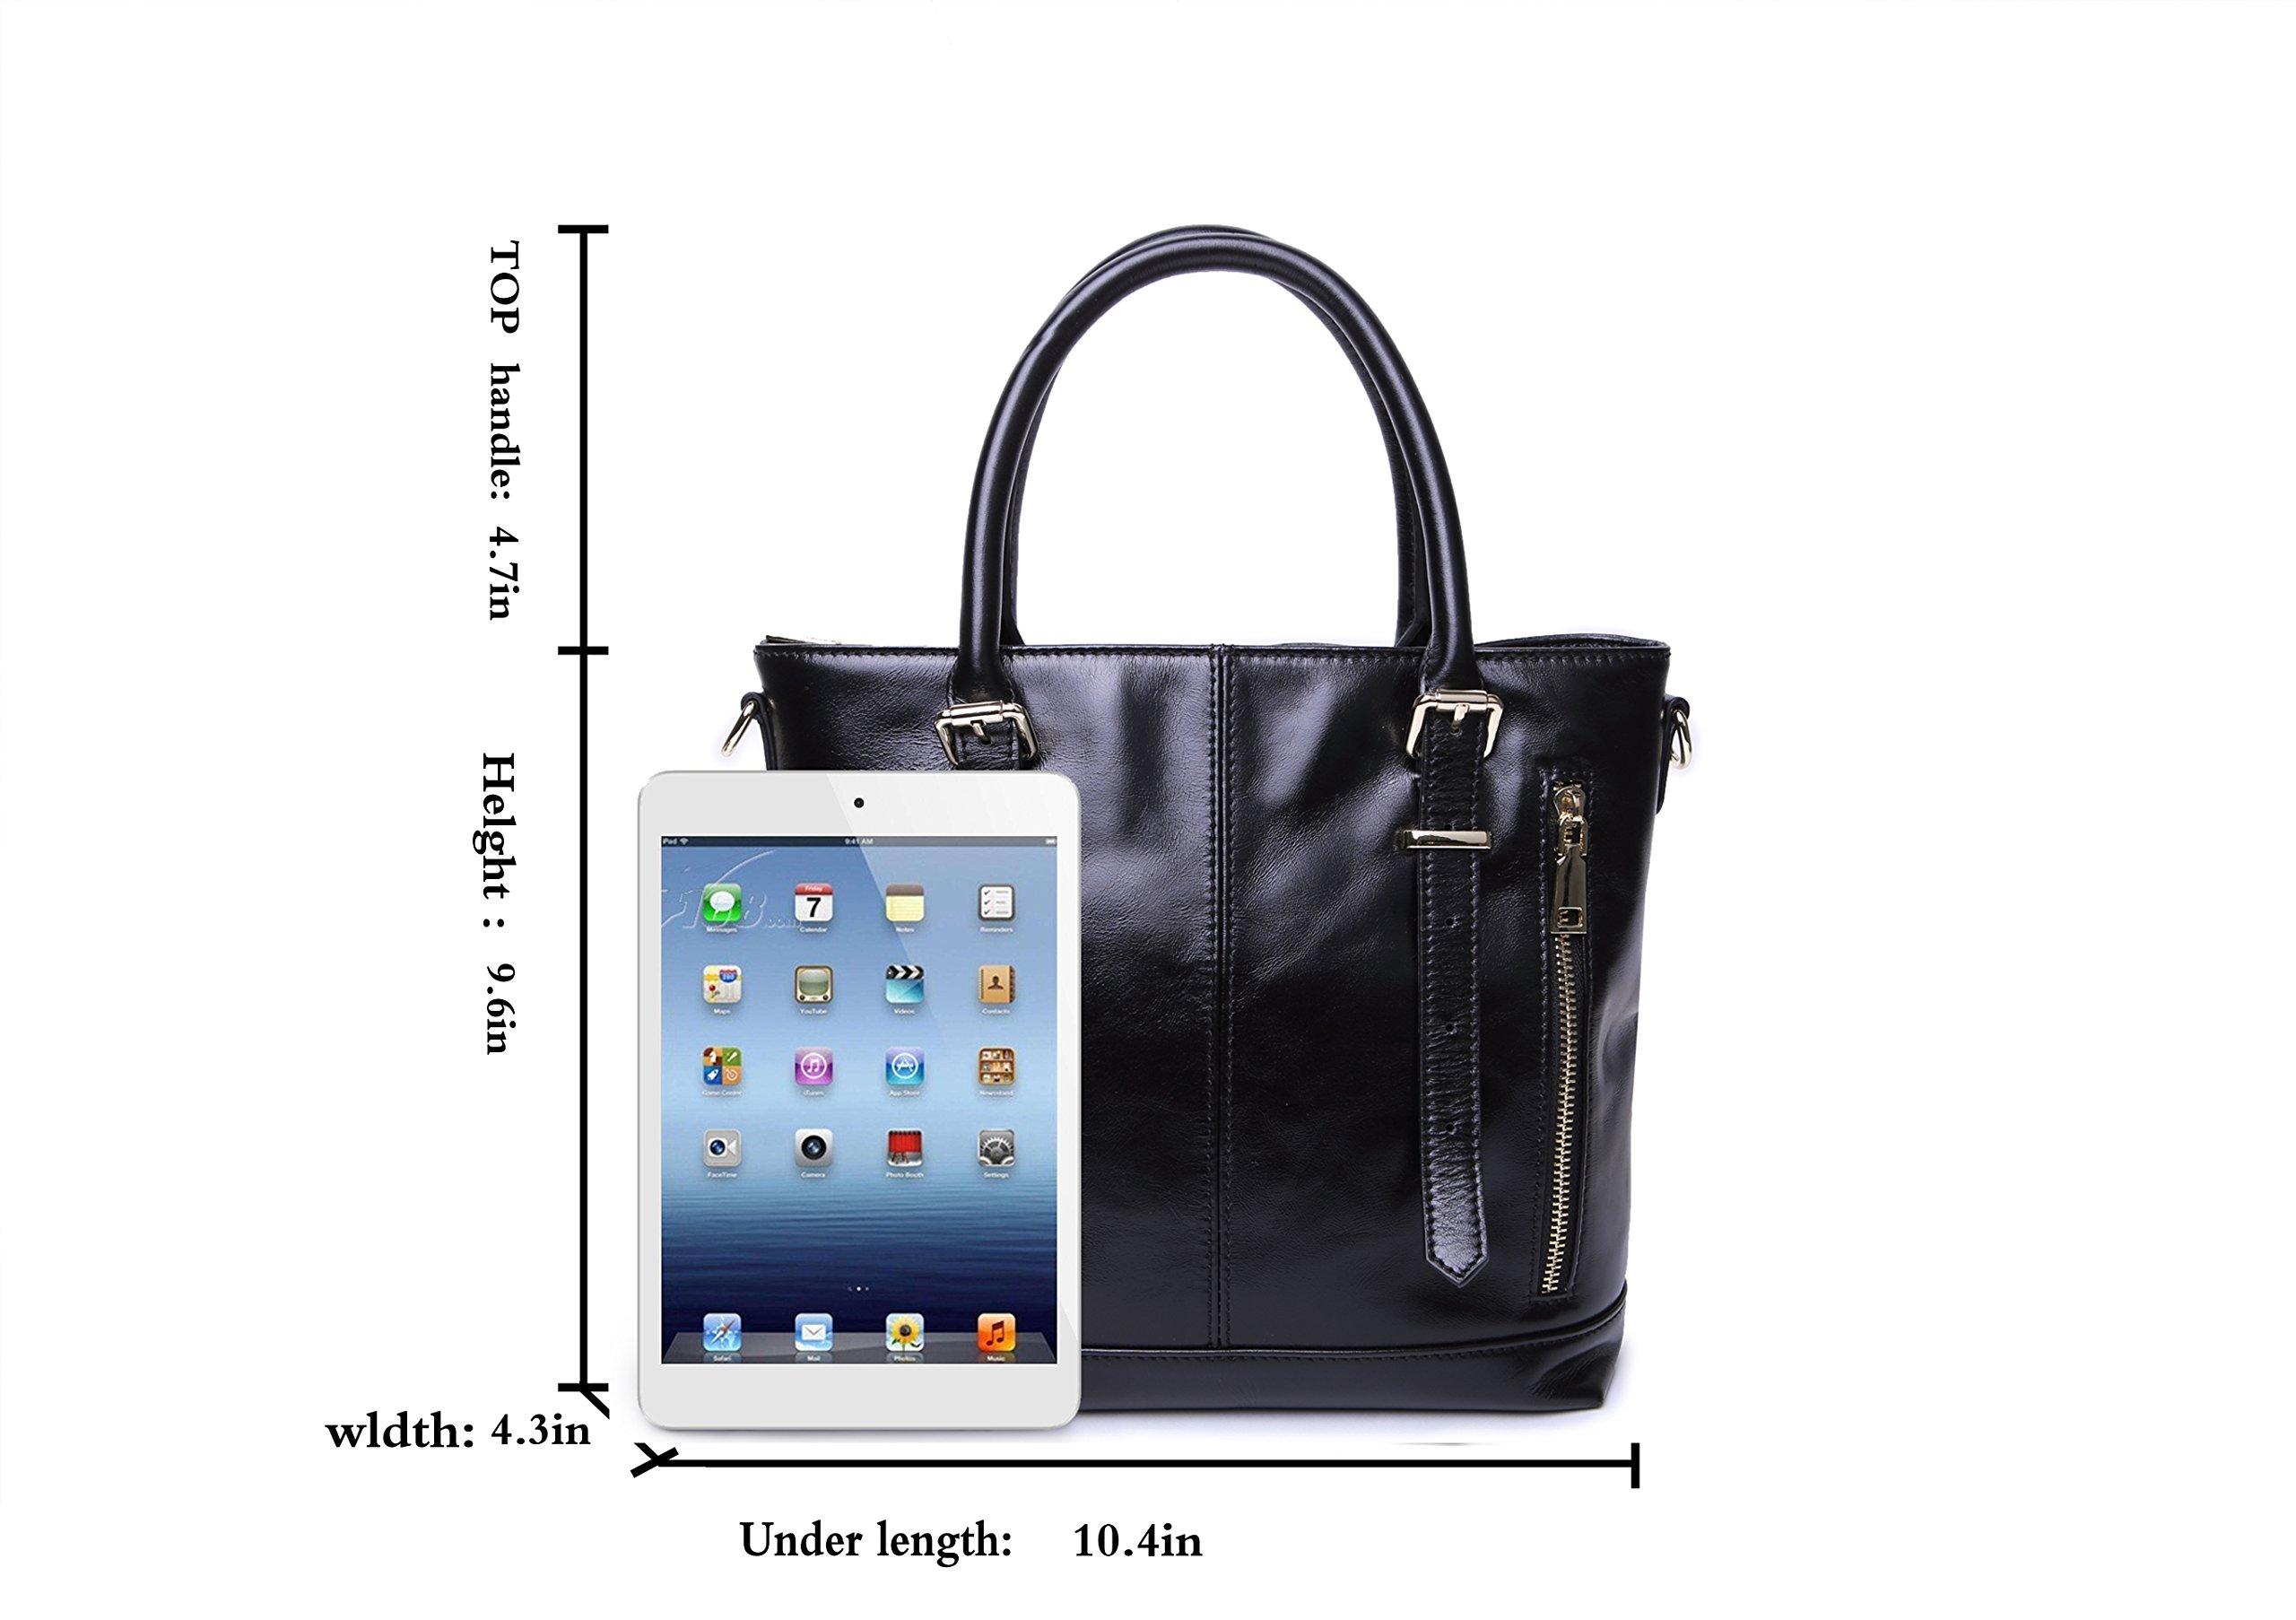 Yafeige Womens Leather Shoulder Handbags Satchel Tote Top Handle Bags Crossbody Handbag Purse for Ladies(Black) by Yafeige (Image #4)